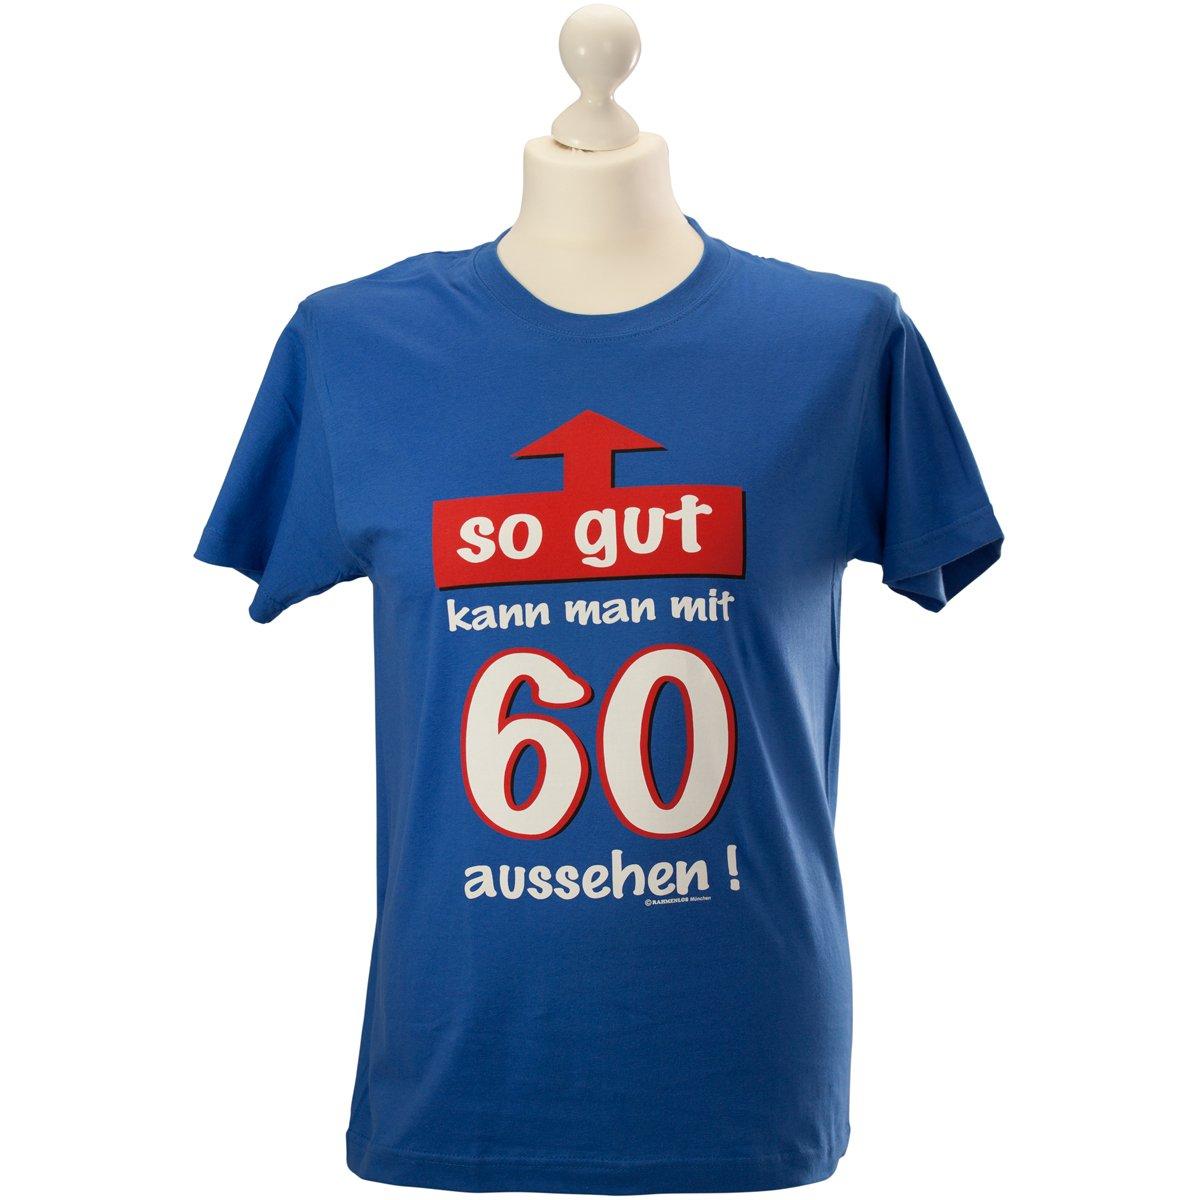 T Shirts Bedrucken Lassen Selbst Gestalten